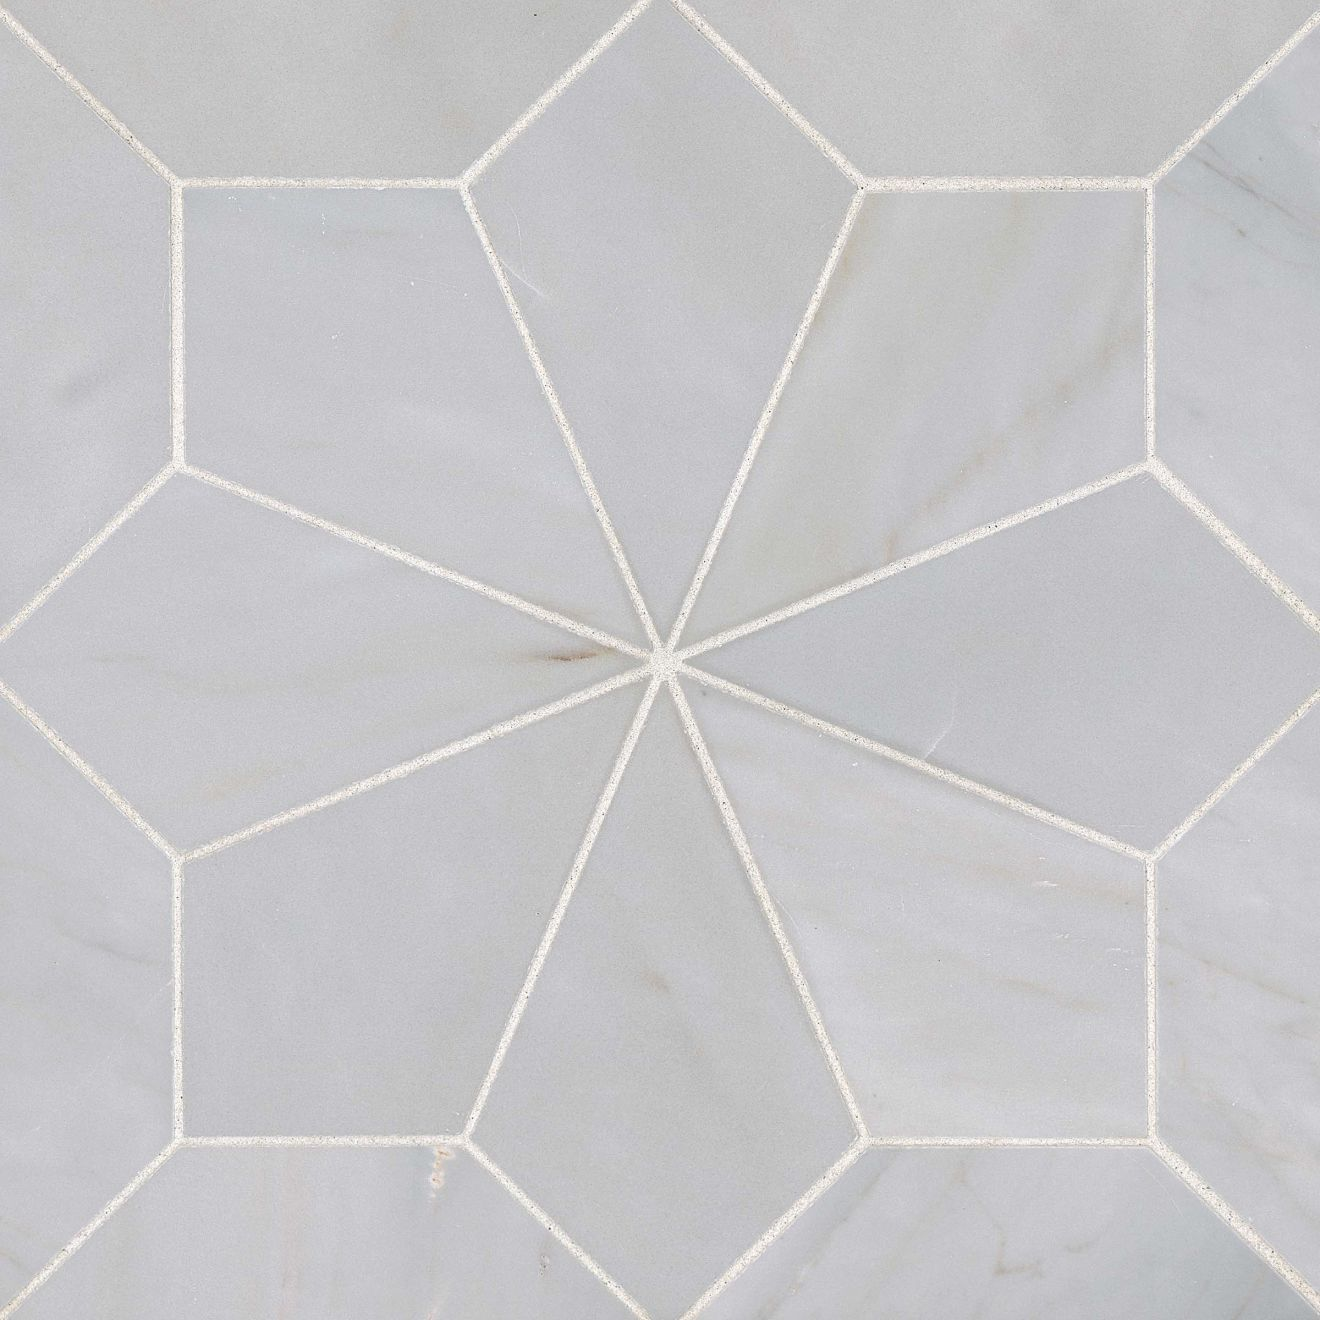 Blomma Floor & Wall Mosaic in Grigio